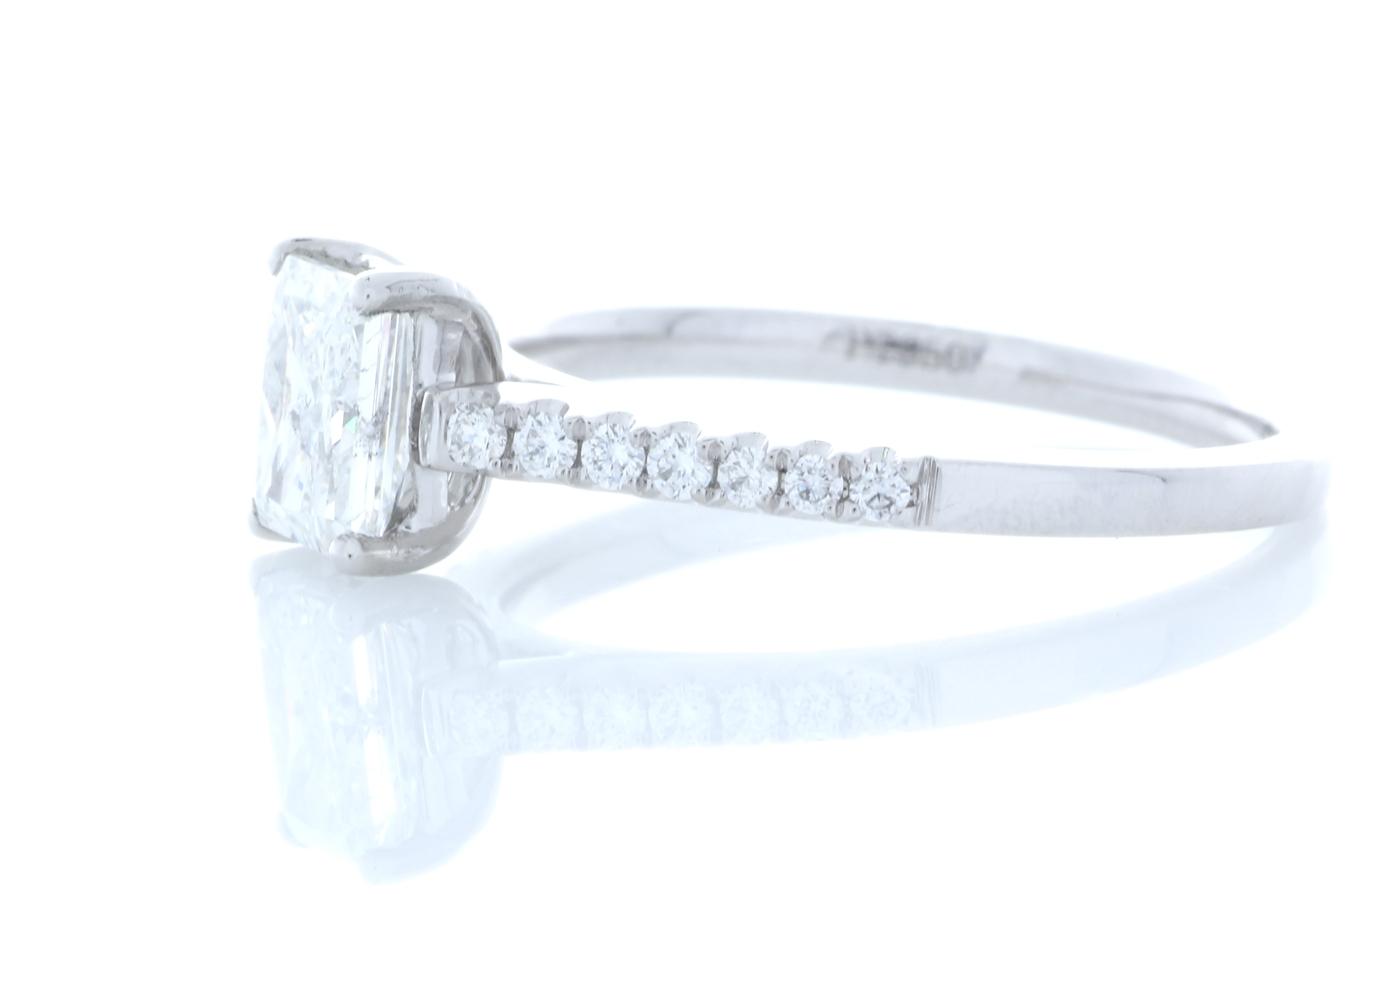 Platinum Stone Set Shoulders Diamond Ring 1.07 Carats - Image 2 of 5